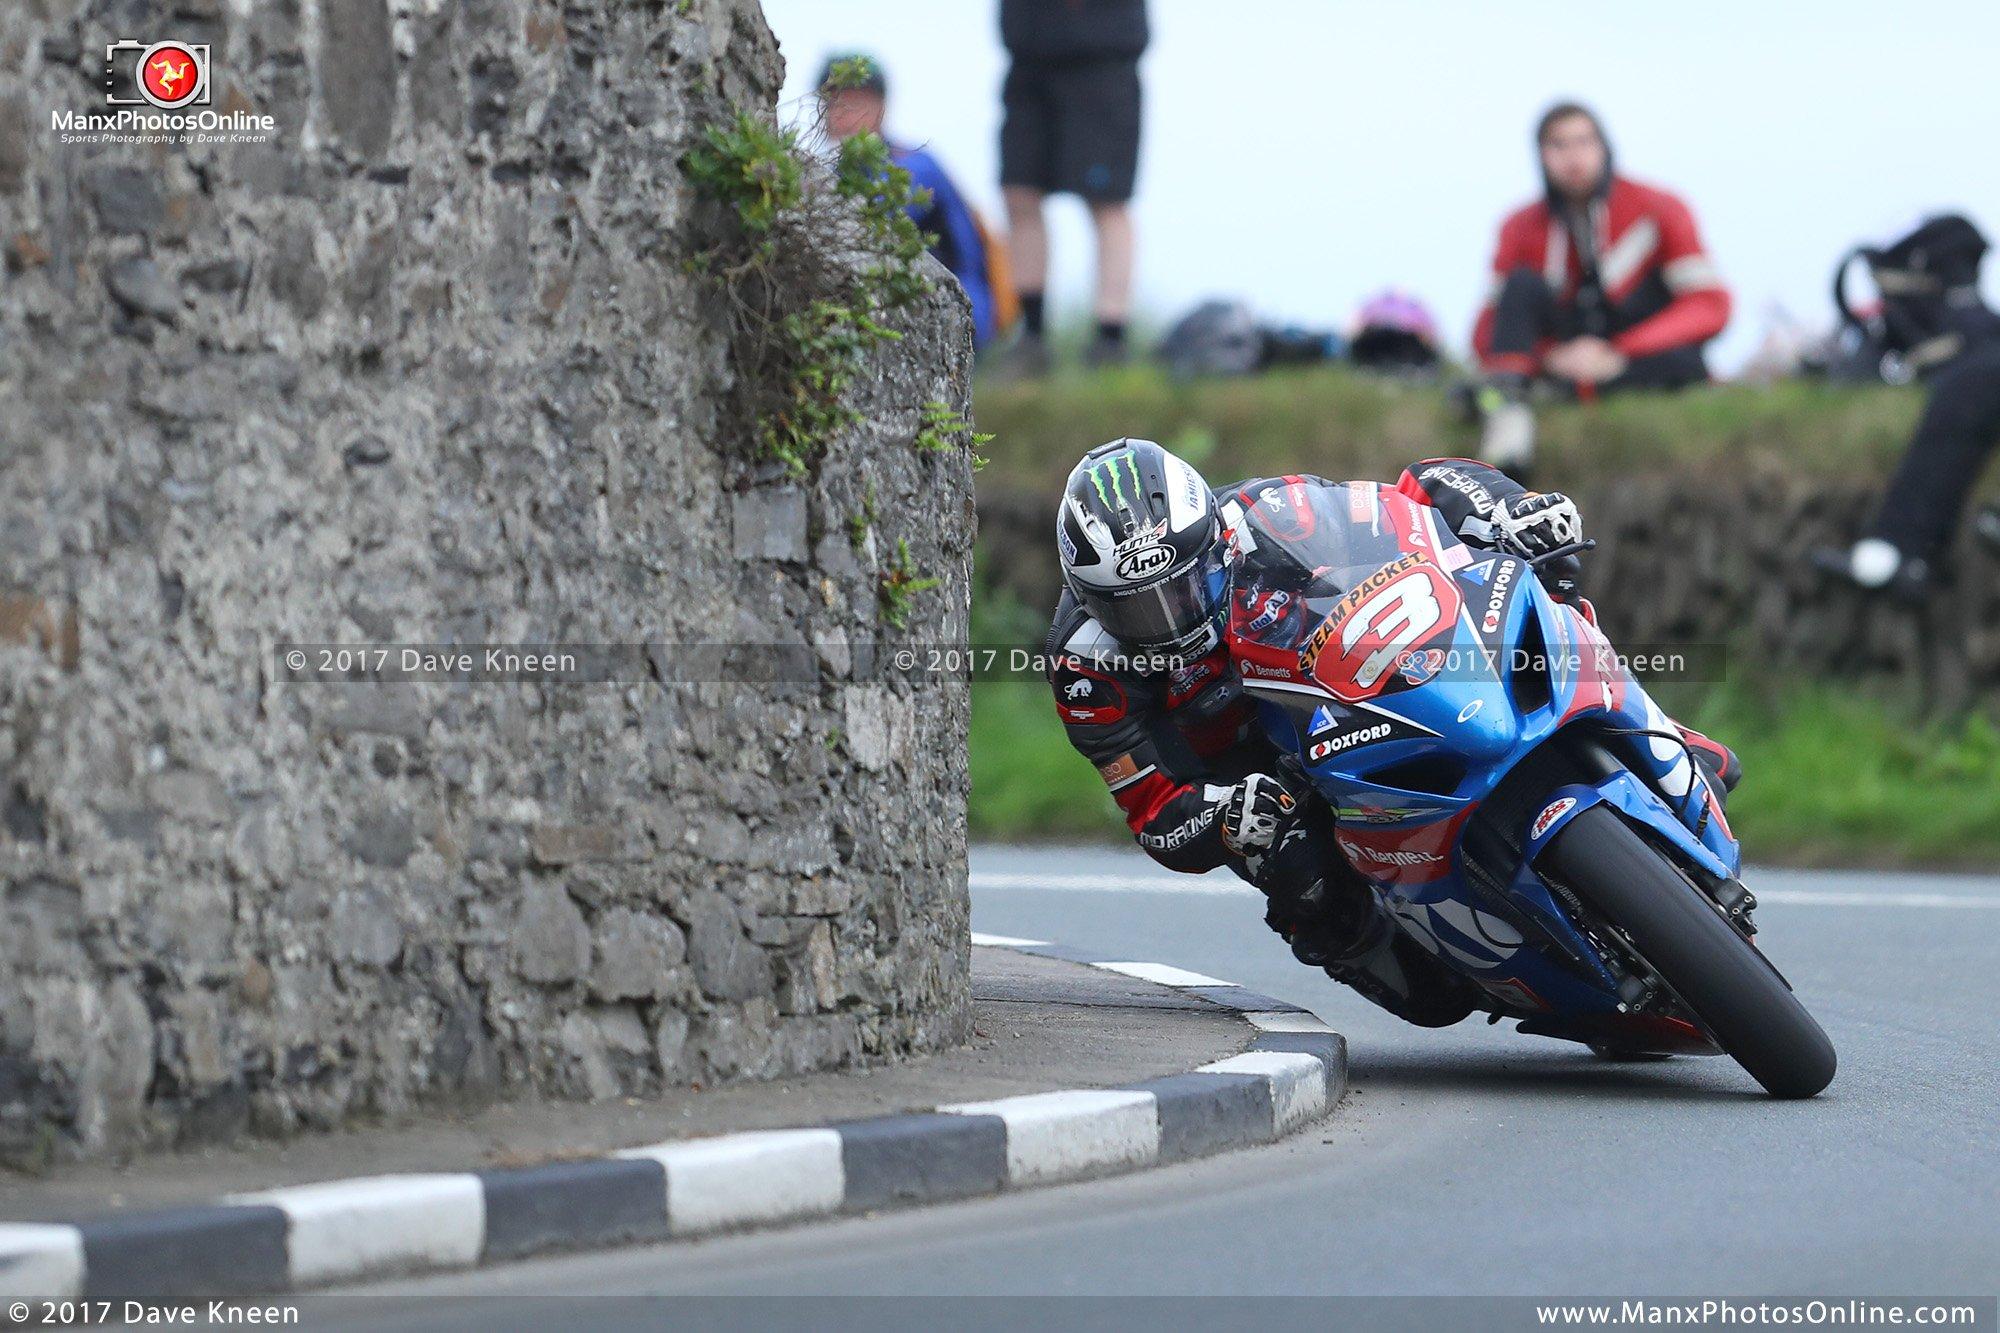 [Road racing] Saison 2017 - Page 7 DEZi64_XUAI4UHm